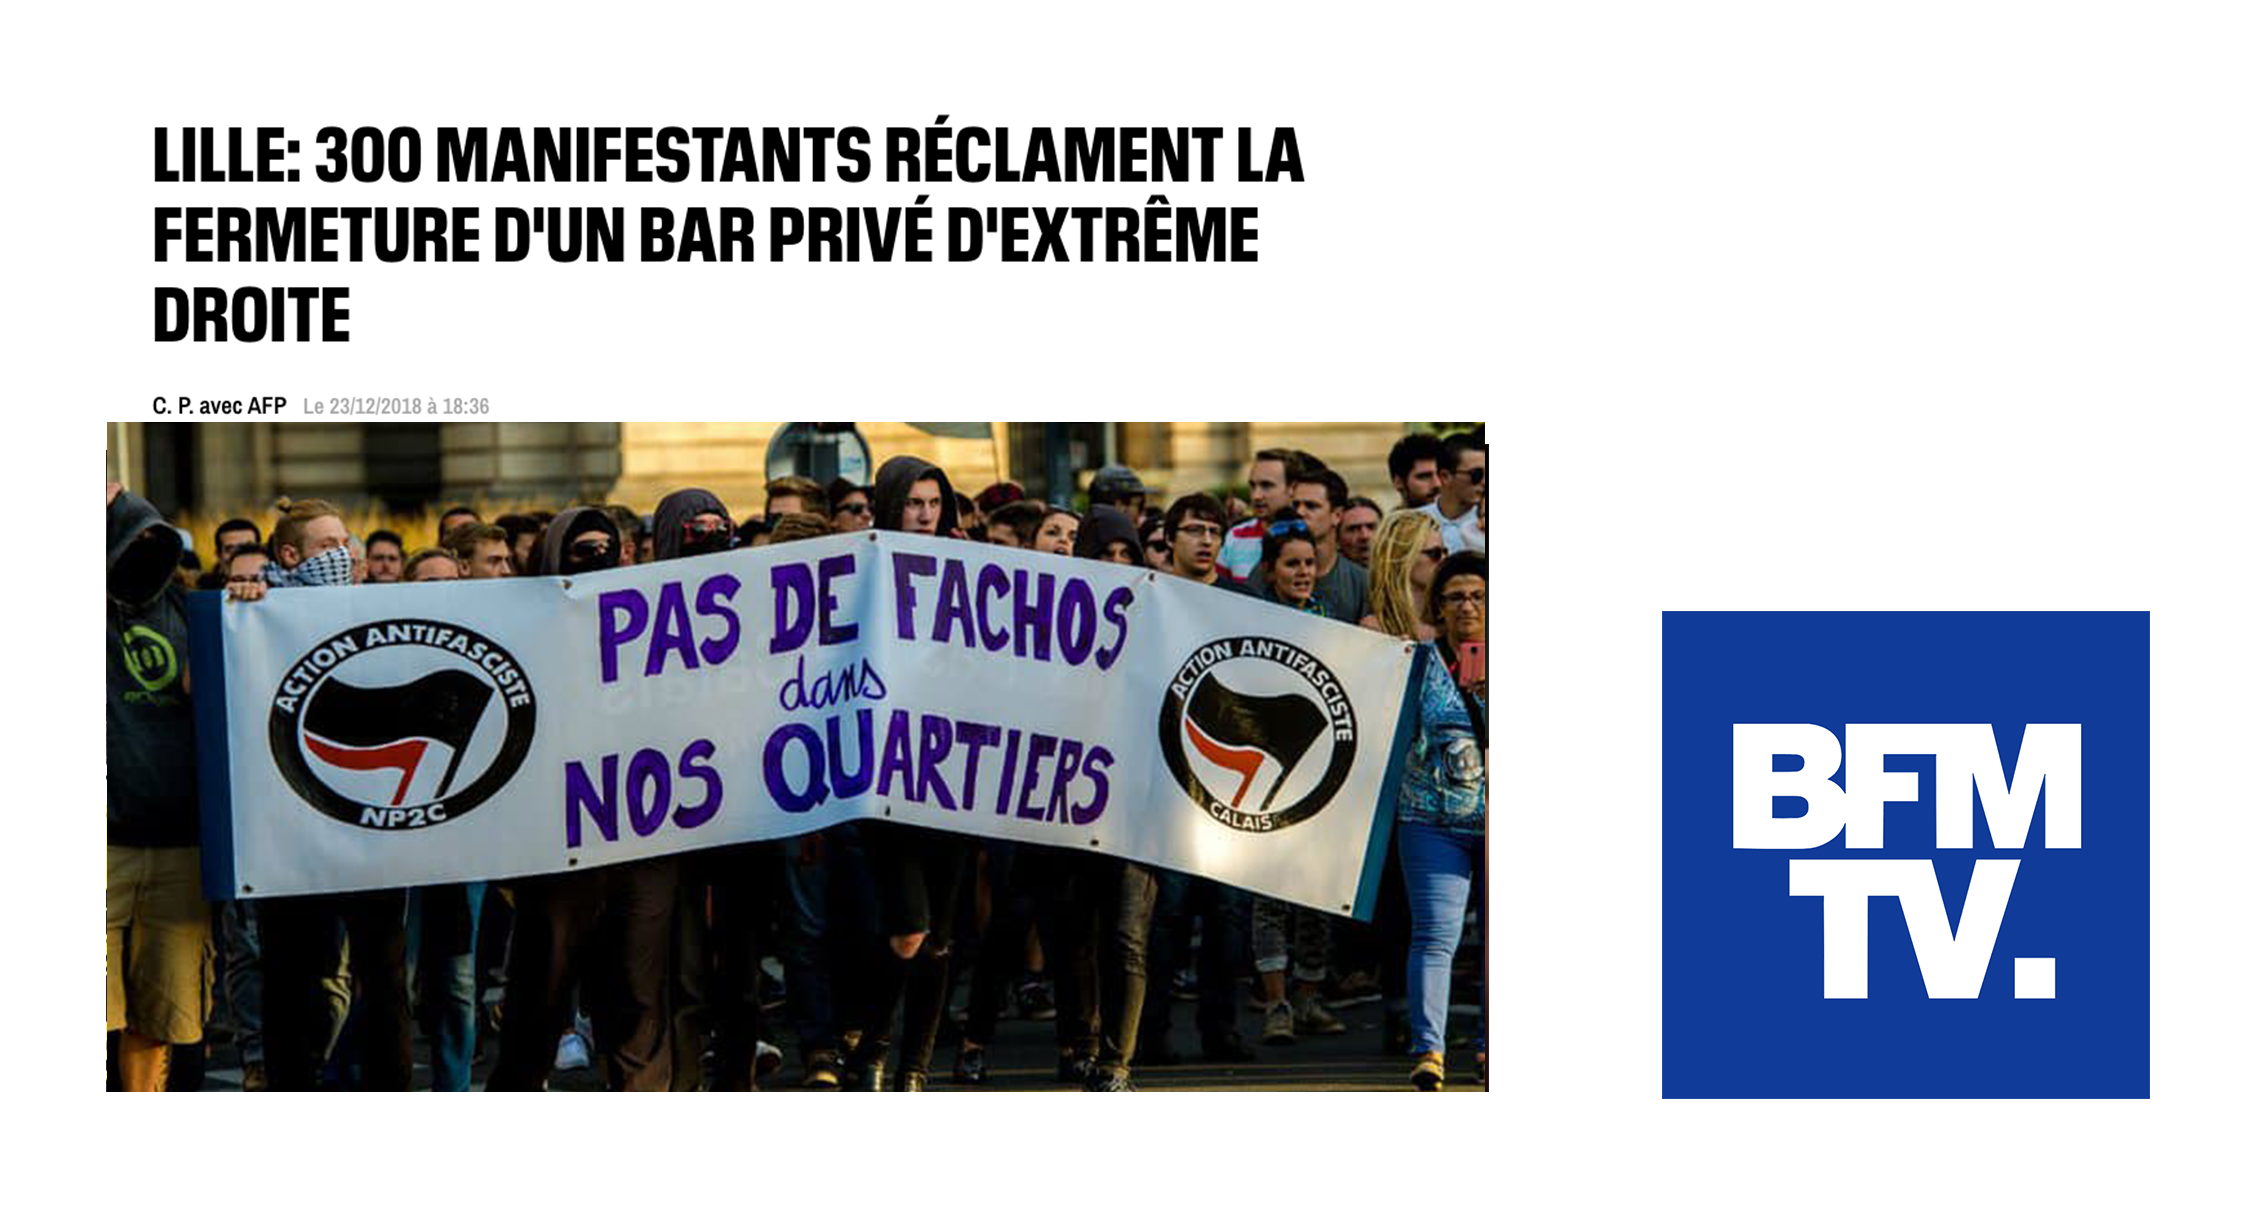 BFMTV: 300 protesters demand closure of far-right bar